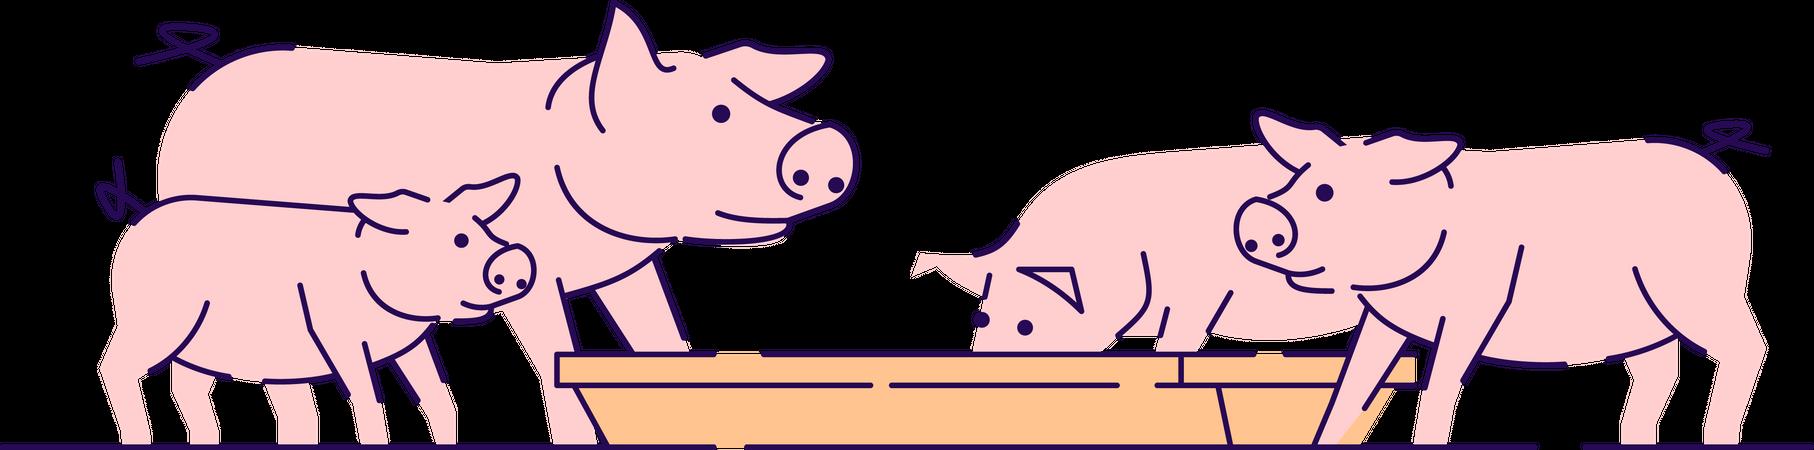 Pigs feeding Illustration